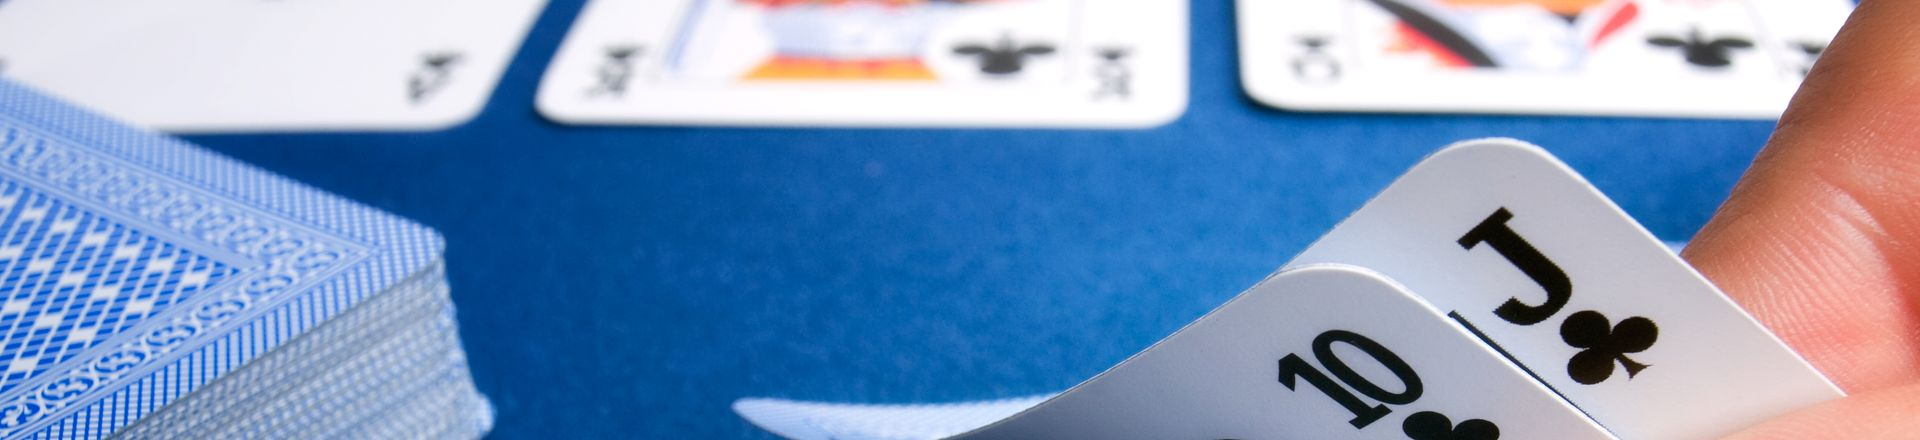 Atlantis casino online video poker